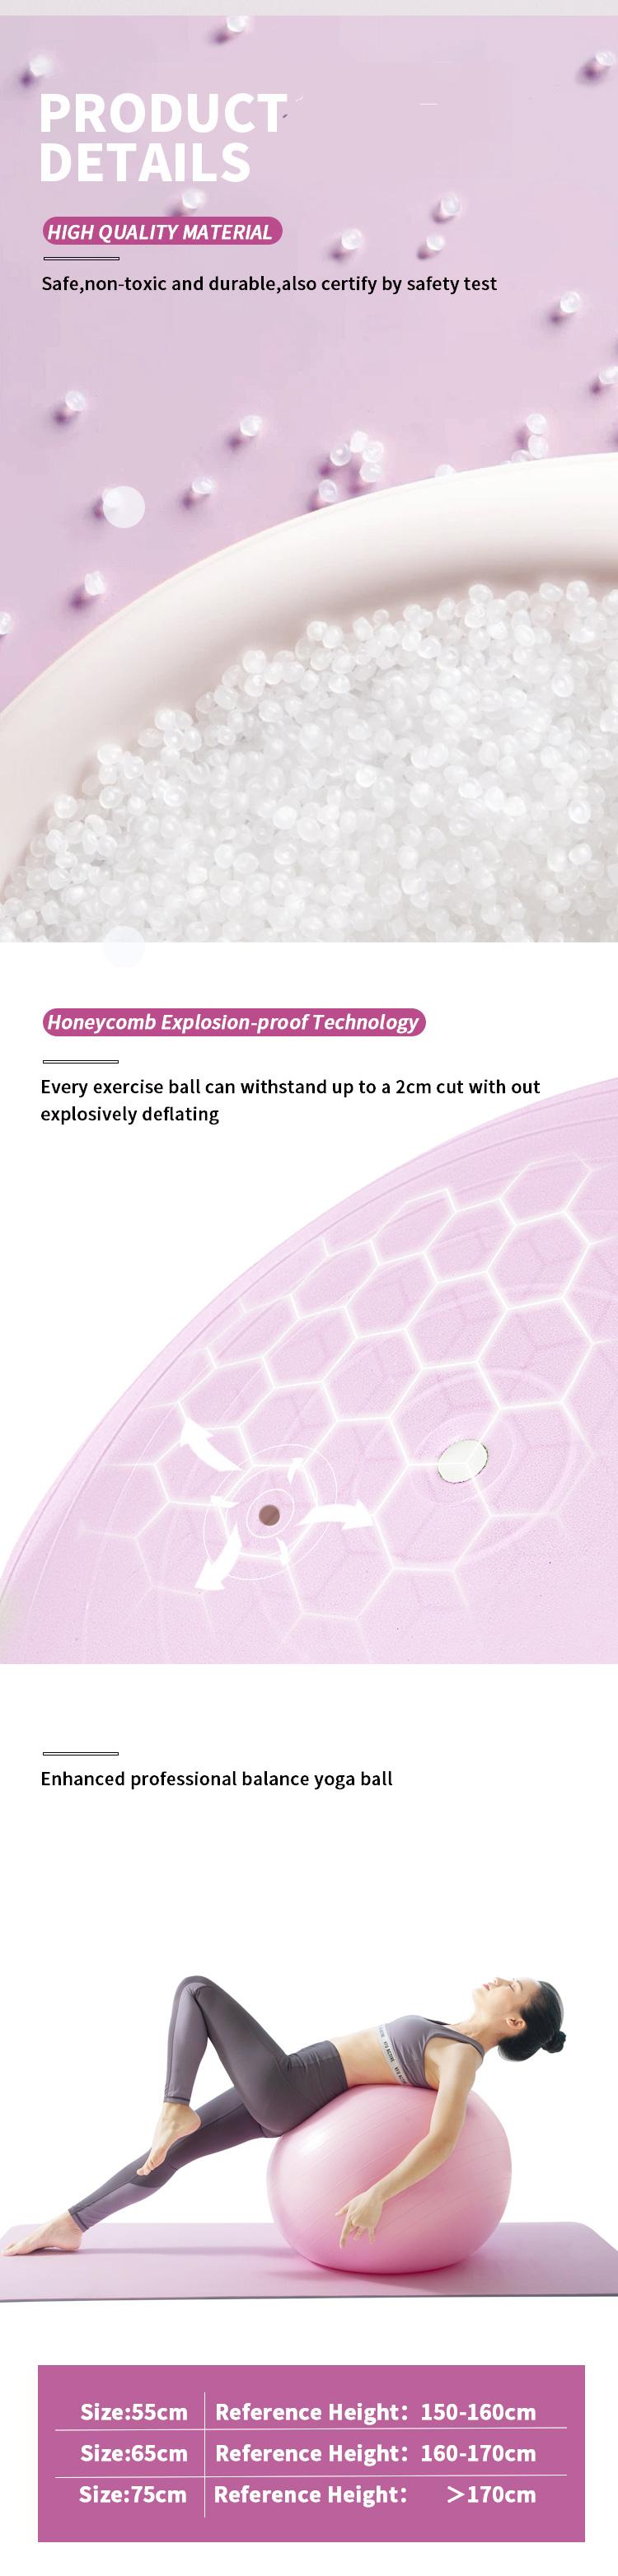 Eco-friendly gymnastics training 65cm gym exercise yoga ball